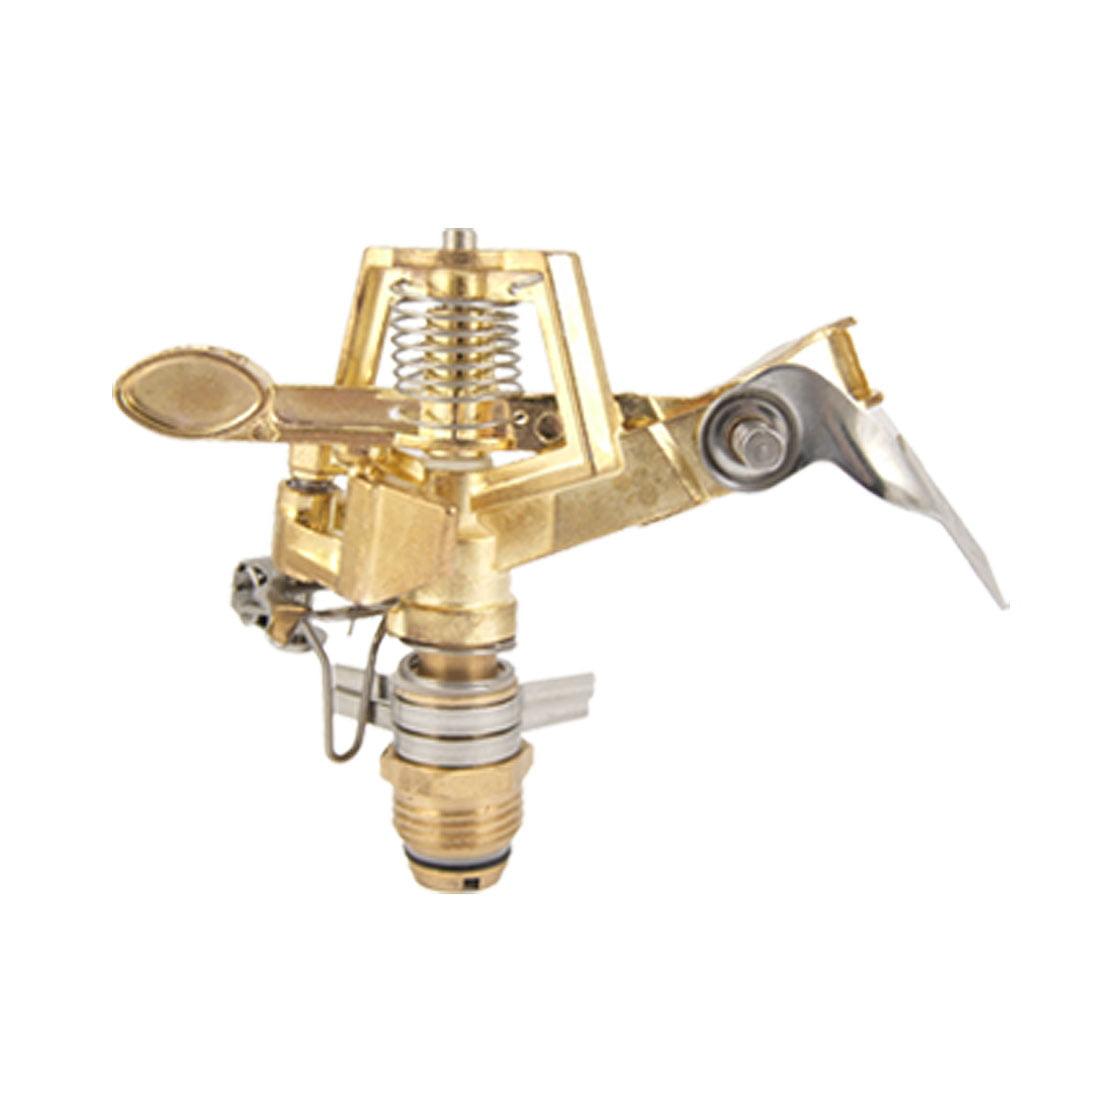 Unique Bargains Lawn Adjustable Nozzle Gold Tone Metal Arm Sprinkler